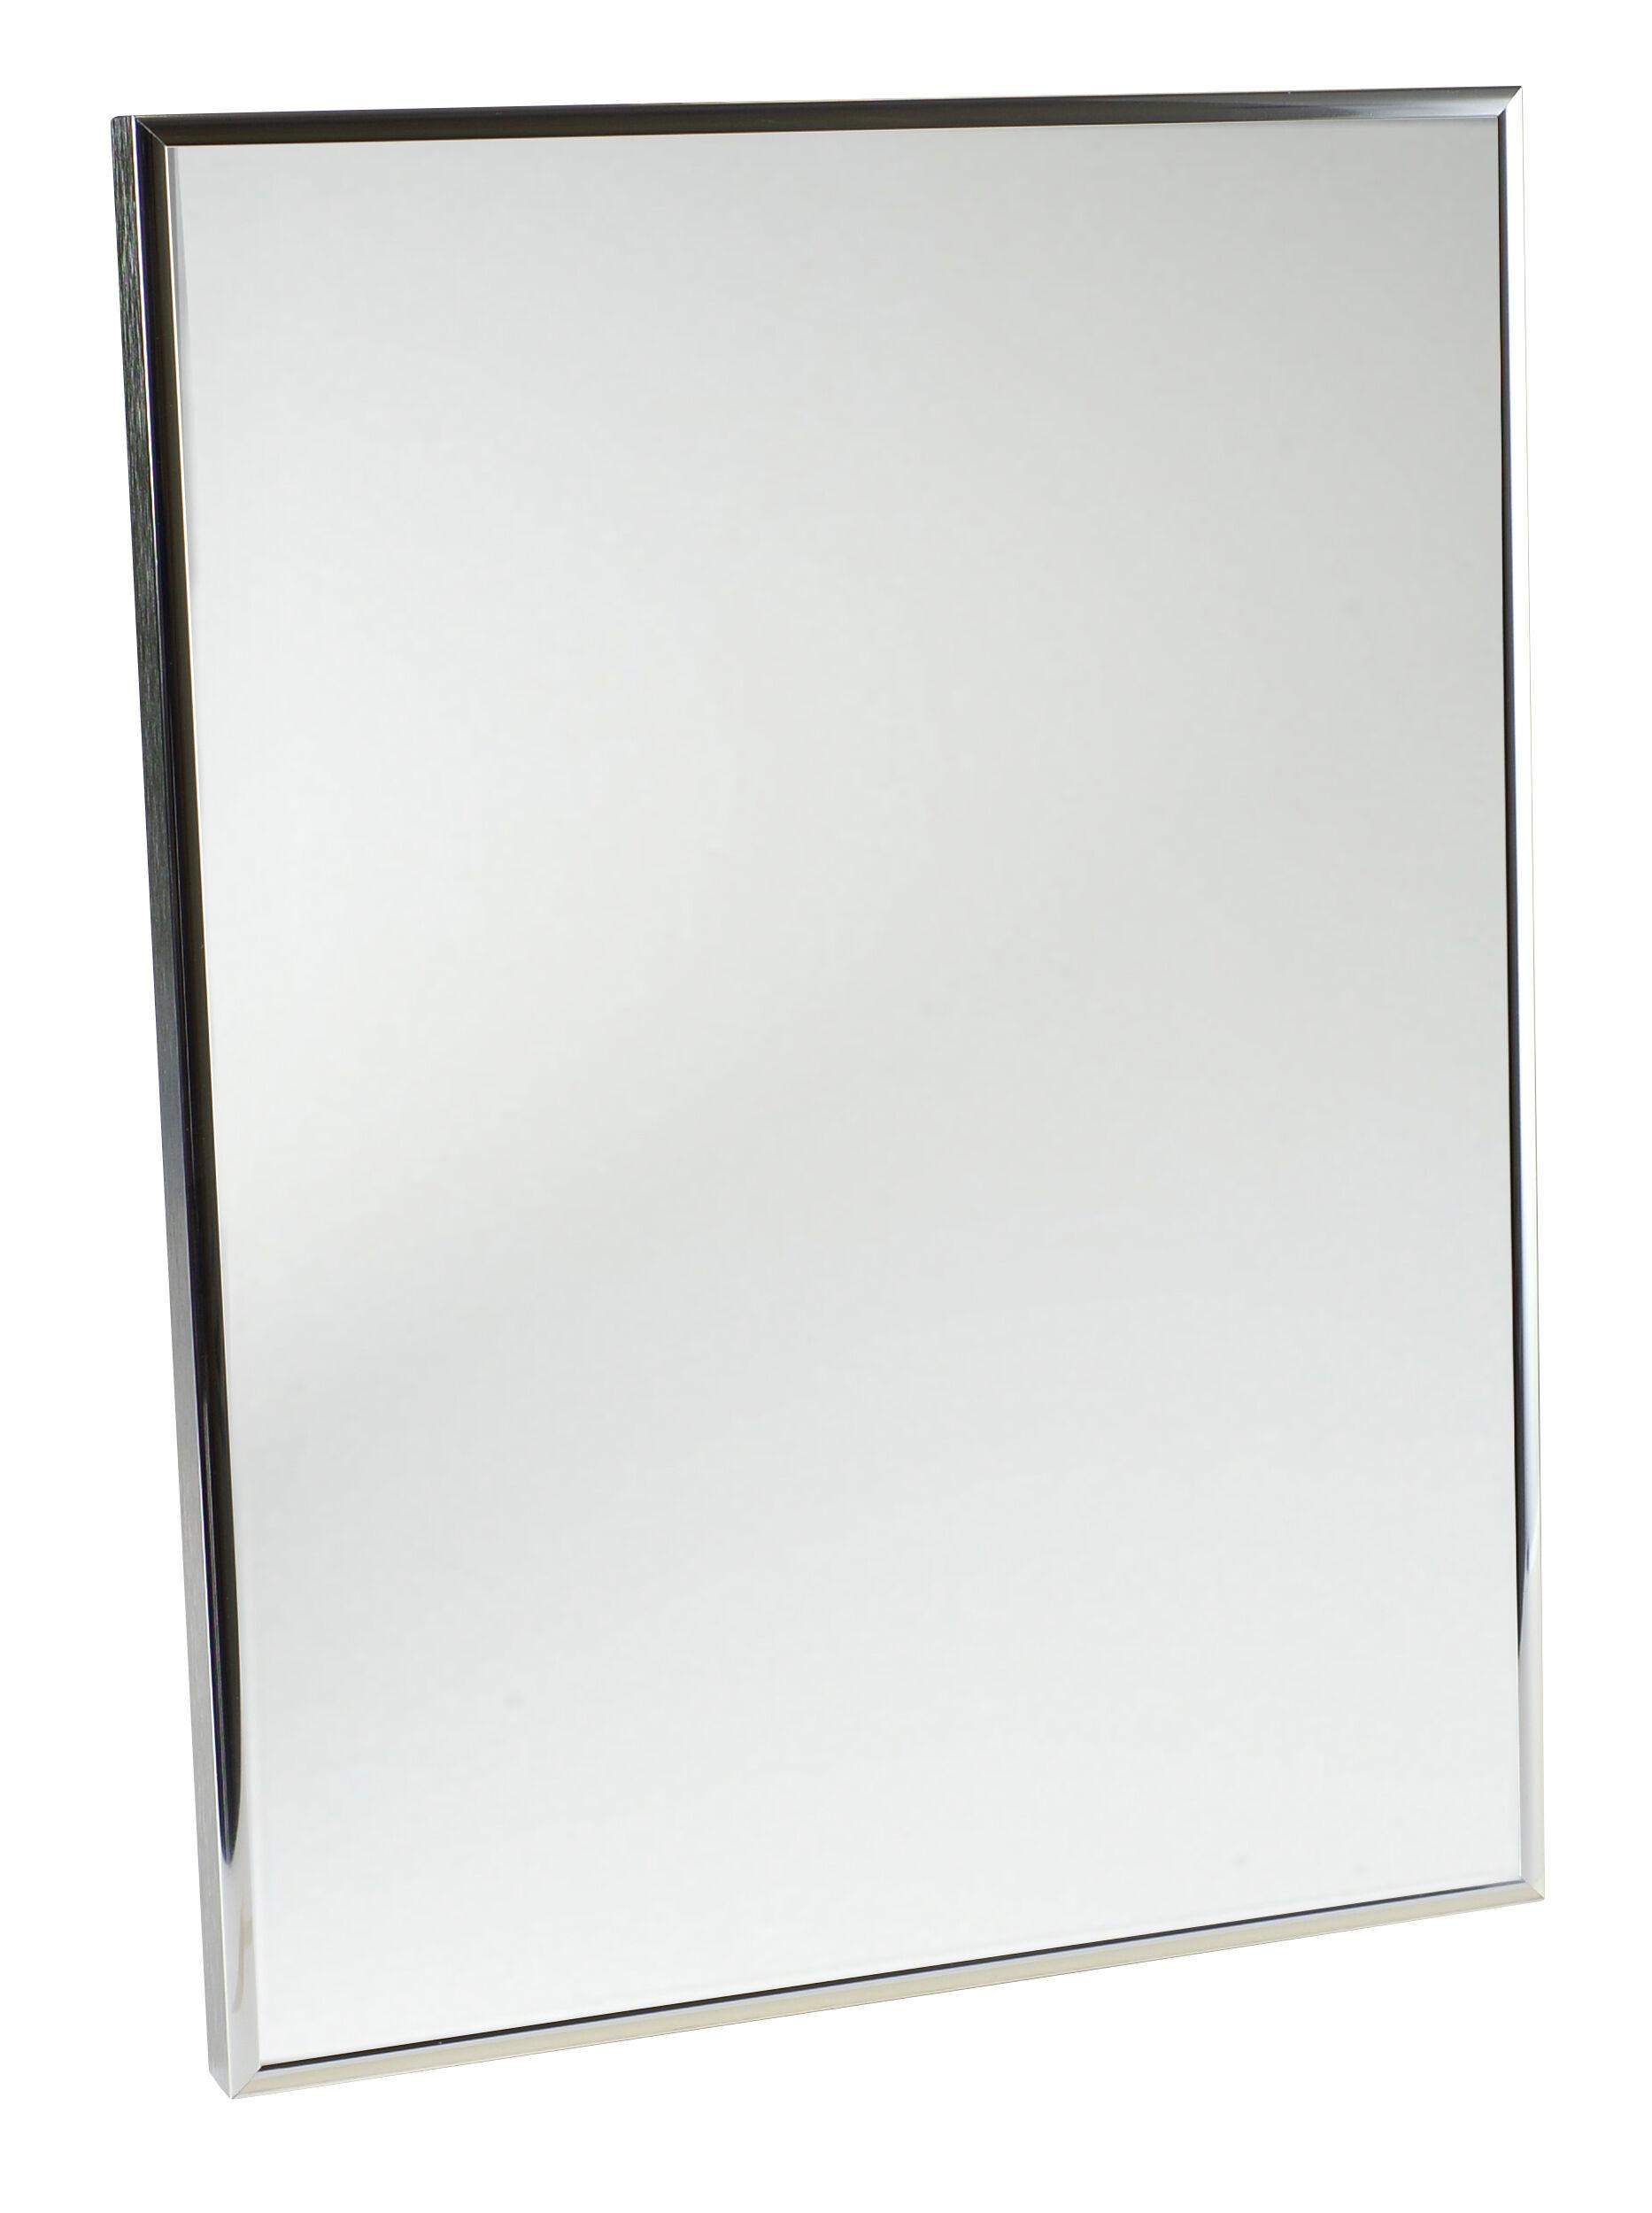 Spegelverkstad Peili Köpenhamn Hopeanvärinen